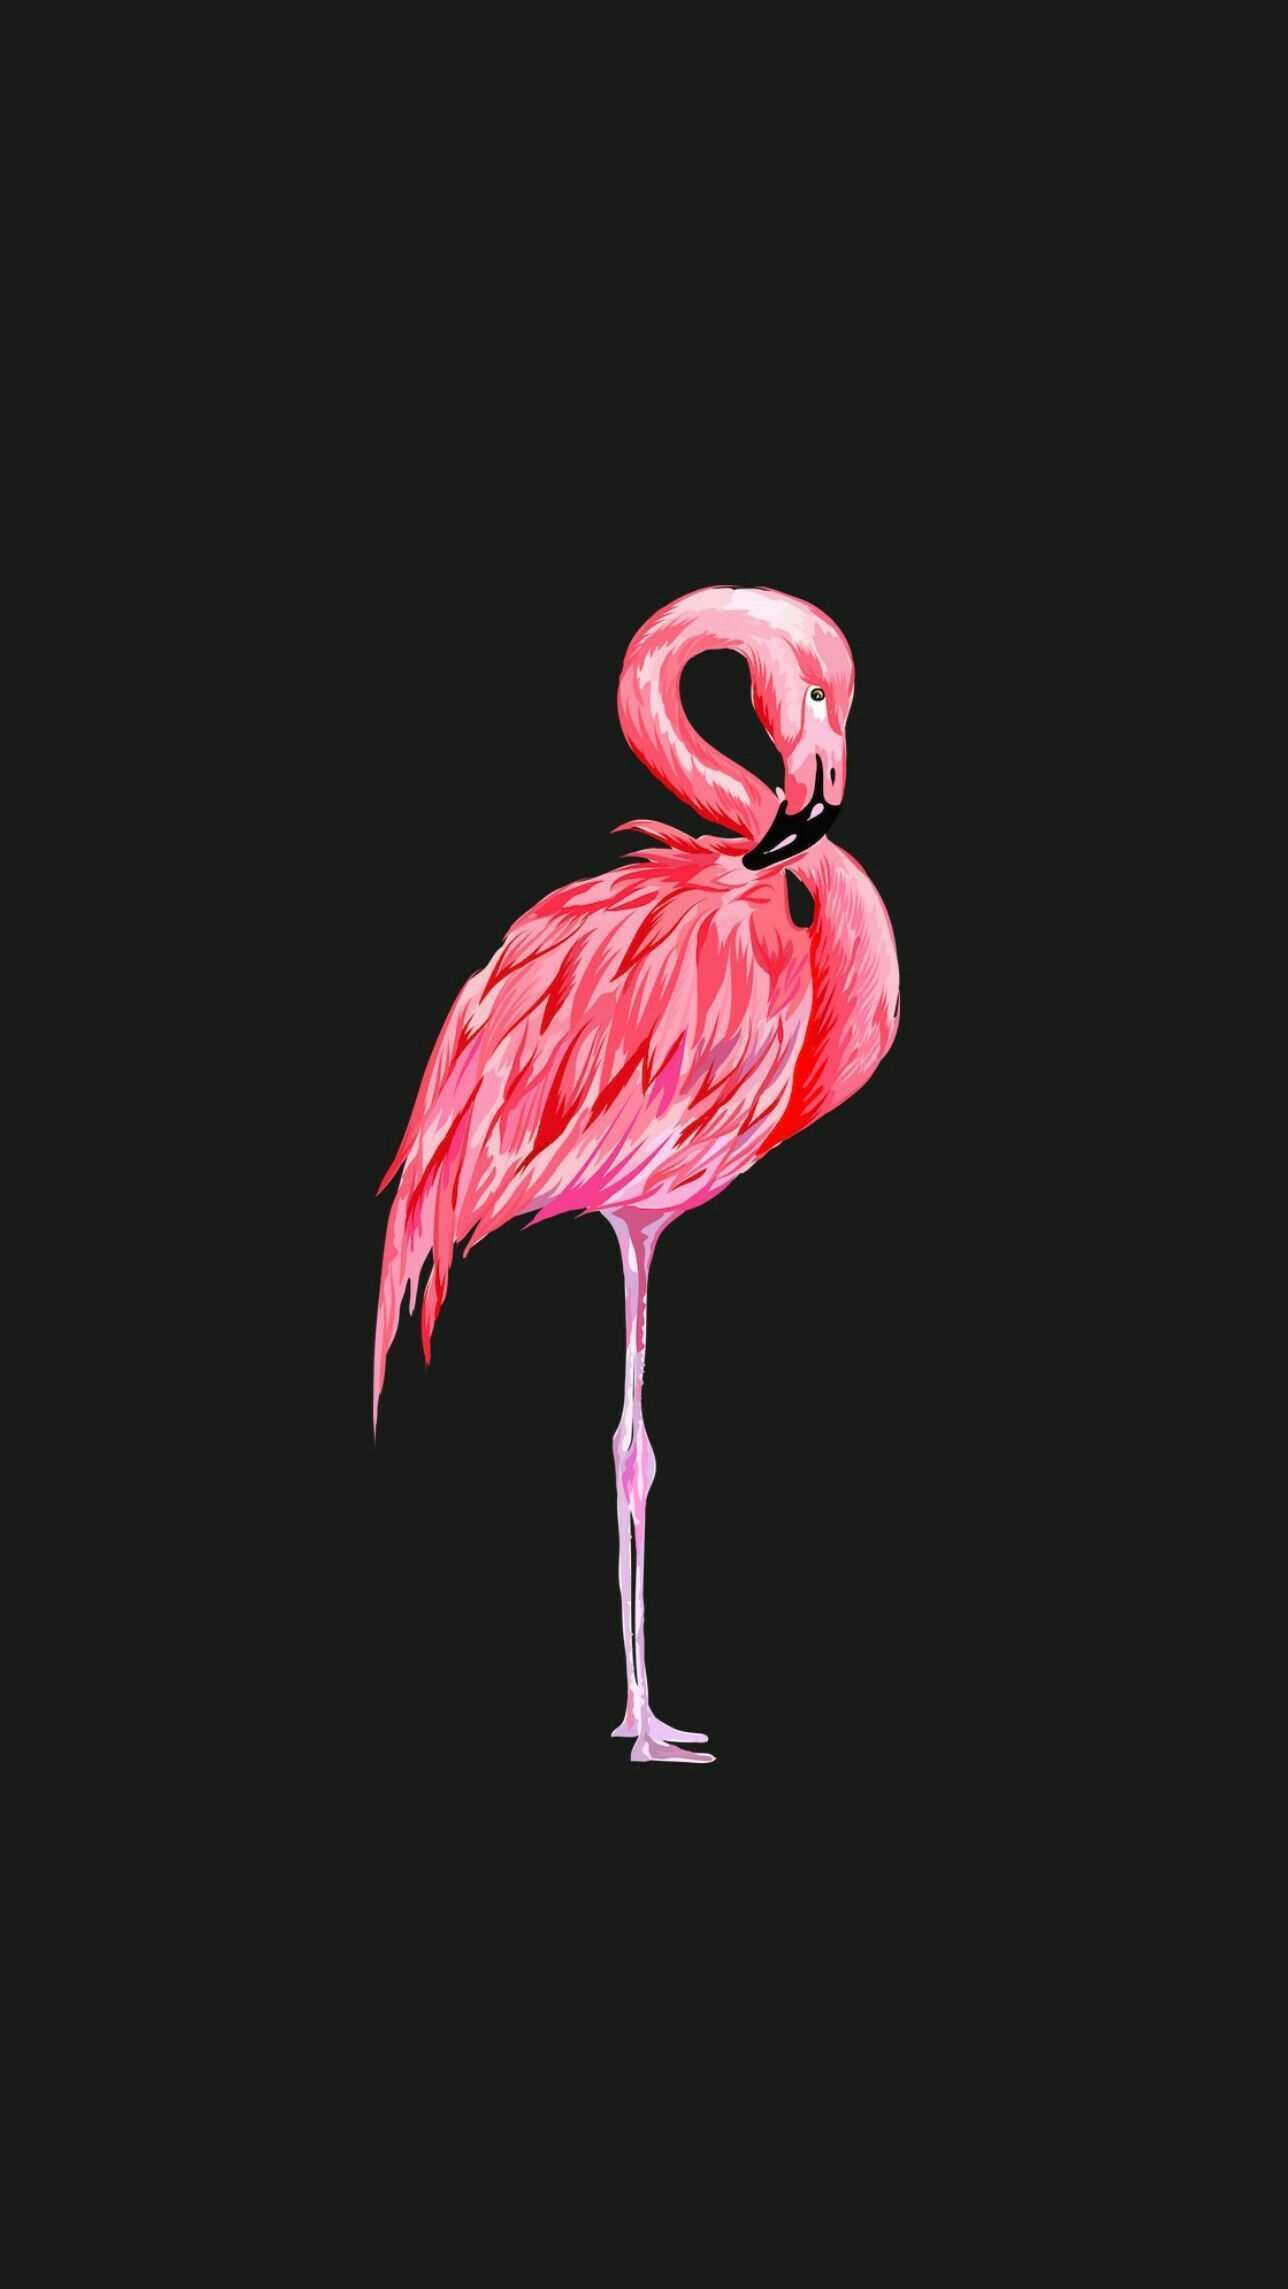 Hintergrund Flamingo Hintergrund Flamingo Animalbackgroundiphone Animalw Hintergrund Flamingo Hinte In 2020 Flamingo Tapete Hintergrund Tier Wallpaper